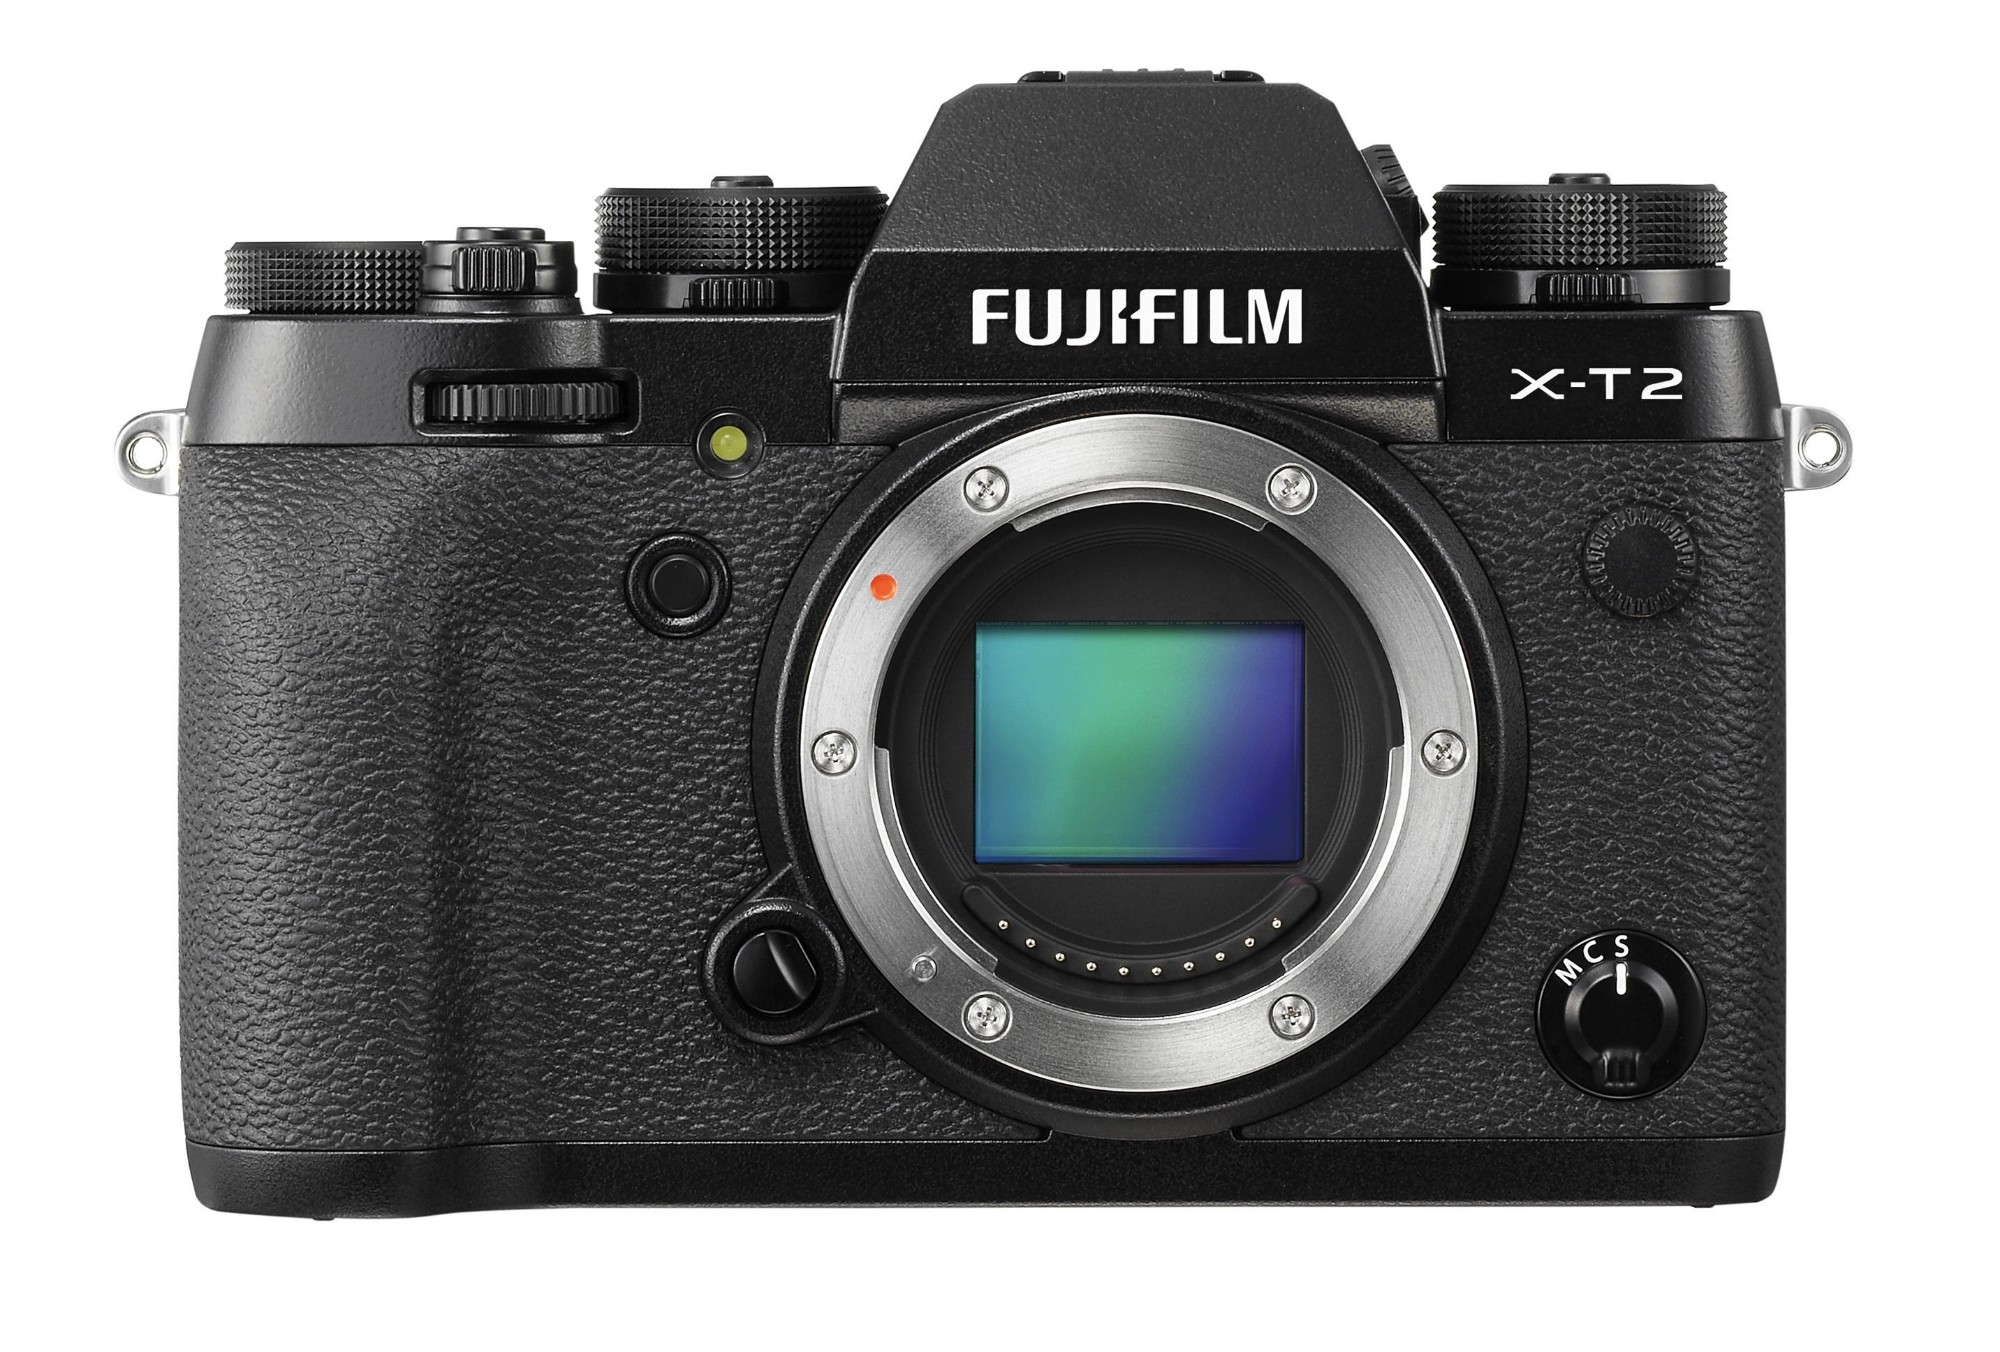 Fujifilm X-T2 Body MILC Body 24MP CMOS III 6000 x 4000pixels Black